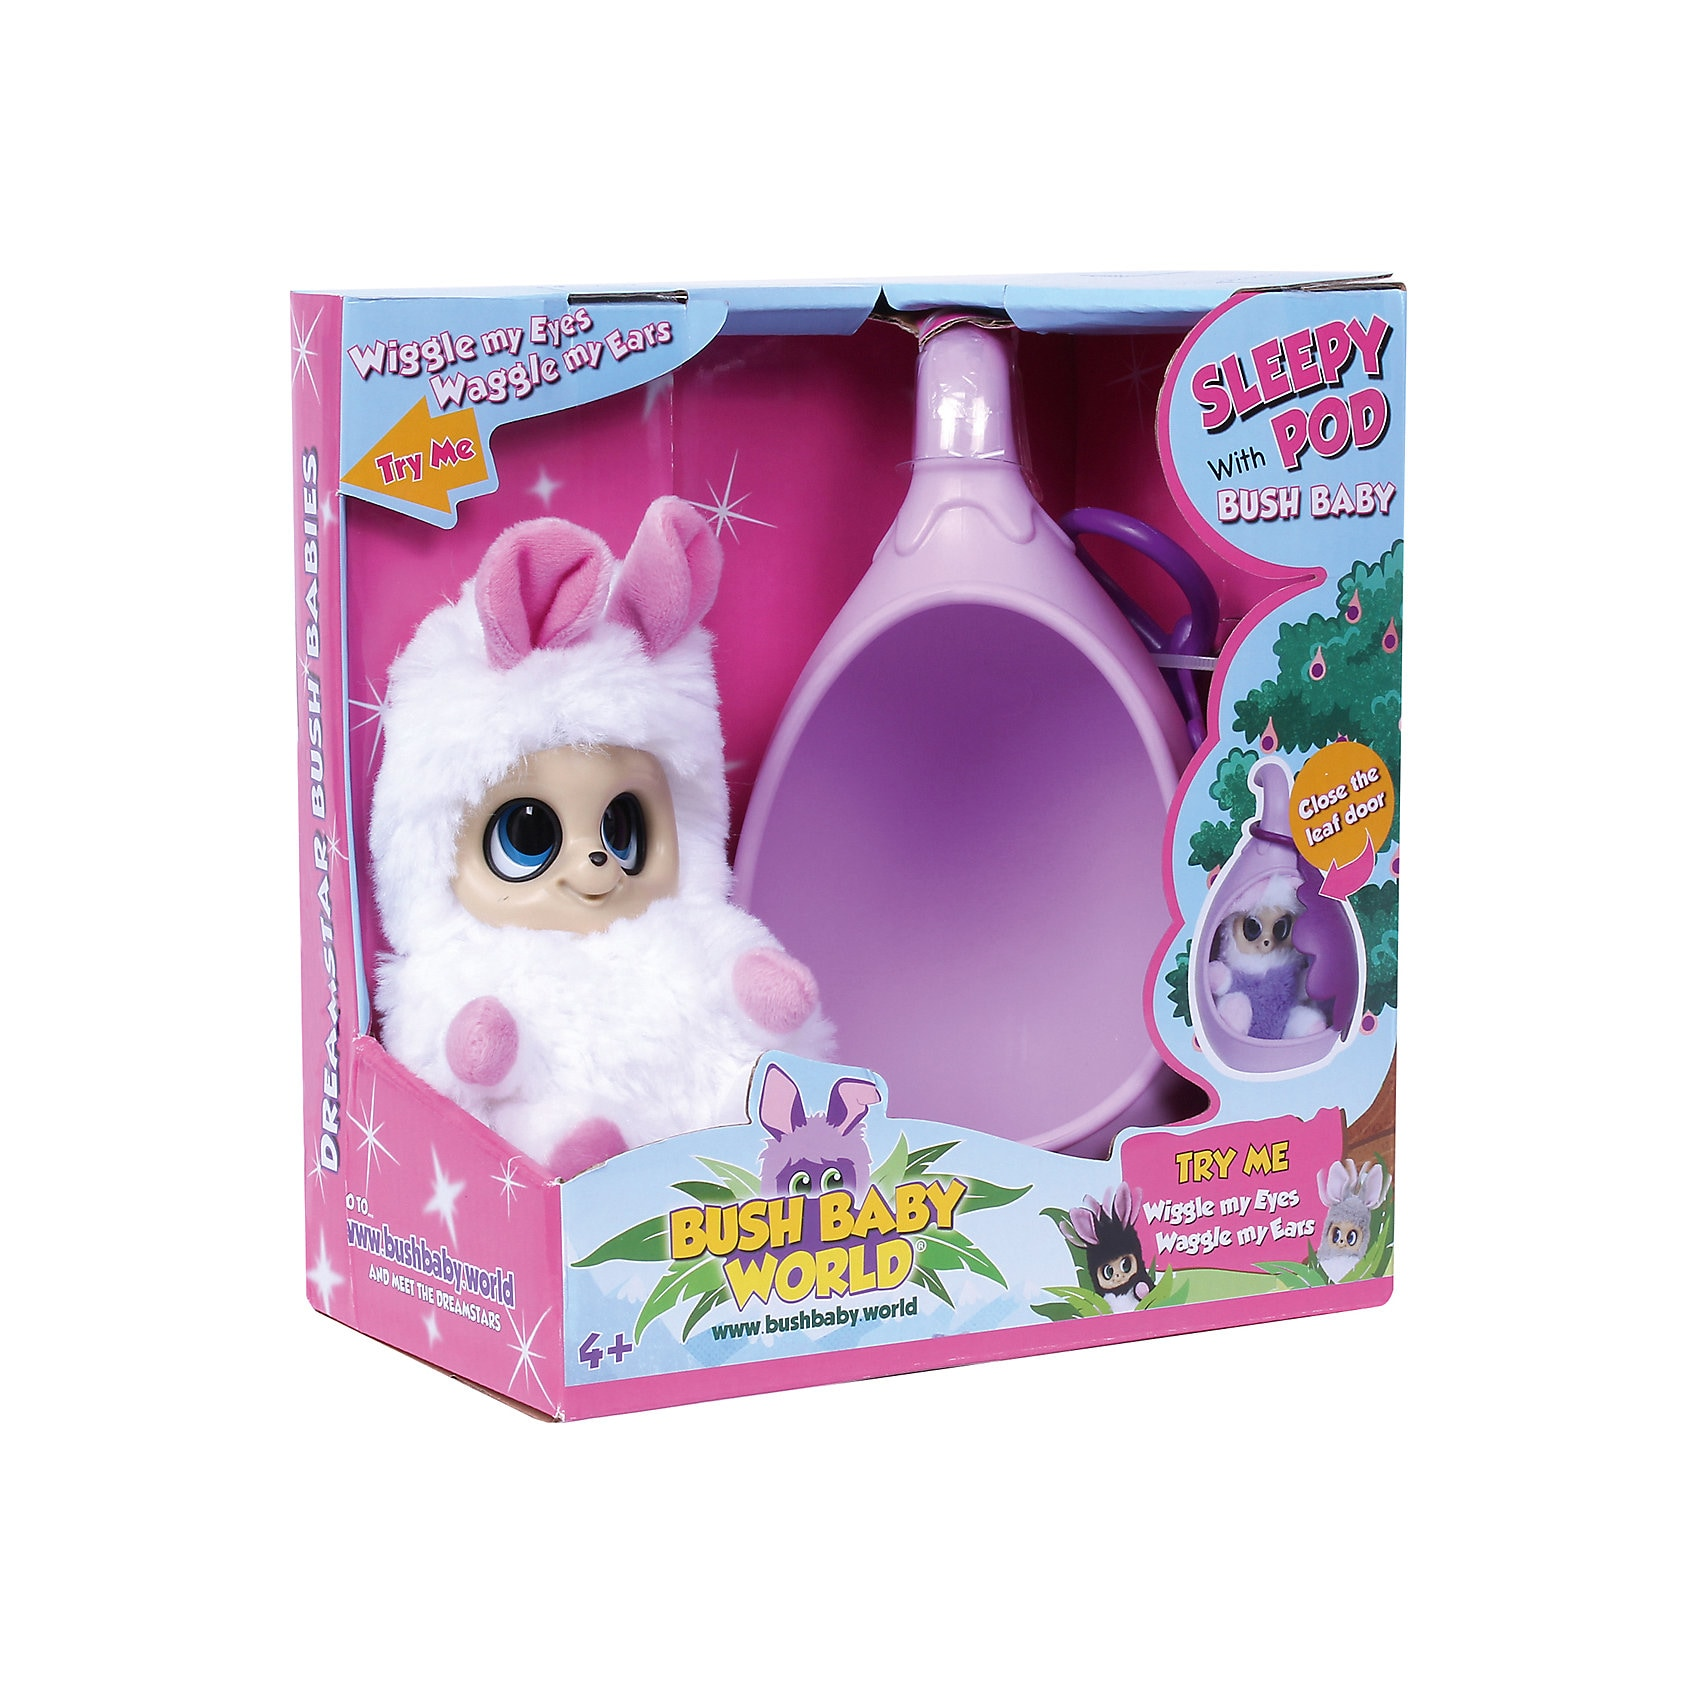 Spectron Toys Bush Baby World Sleepy Pod Sasu